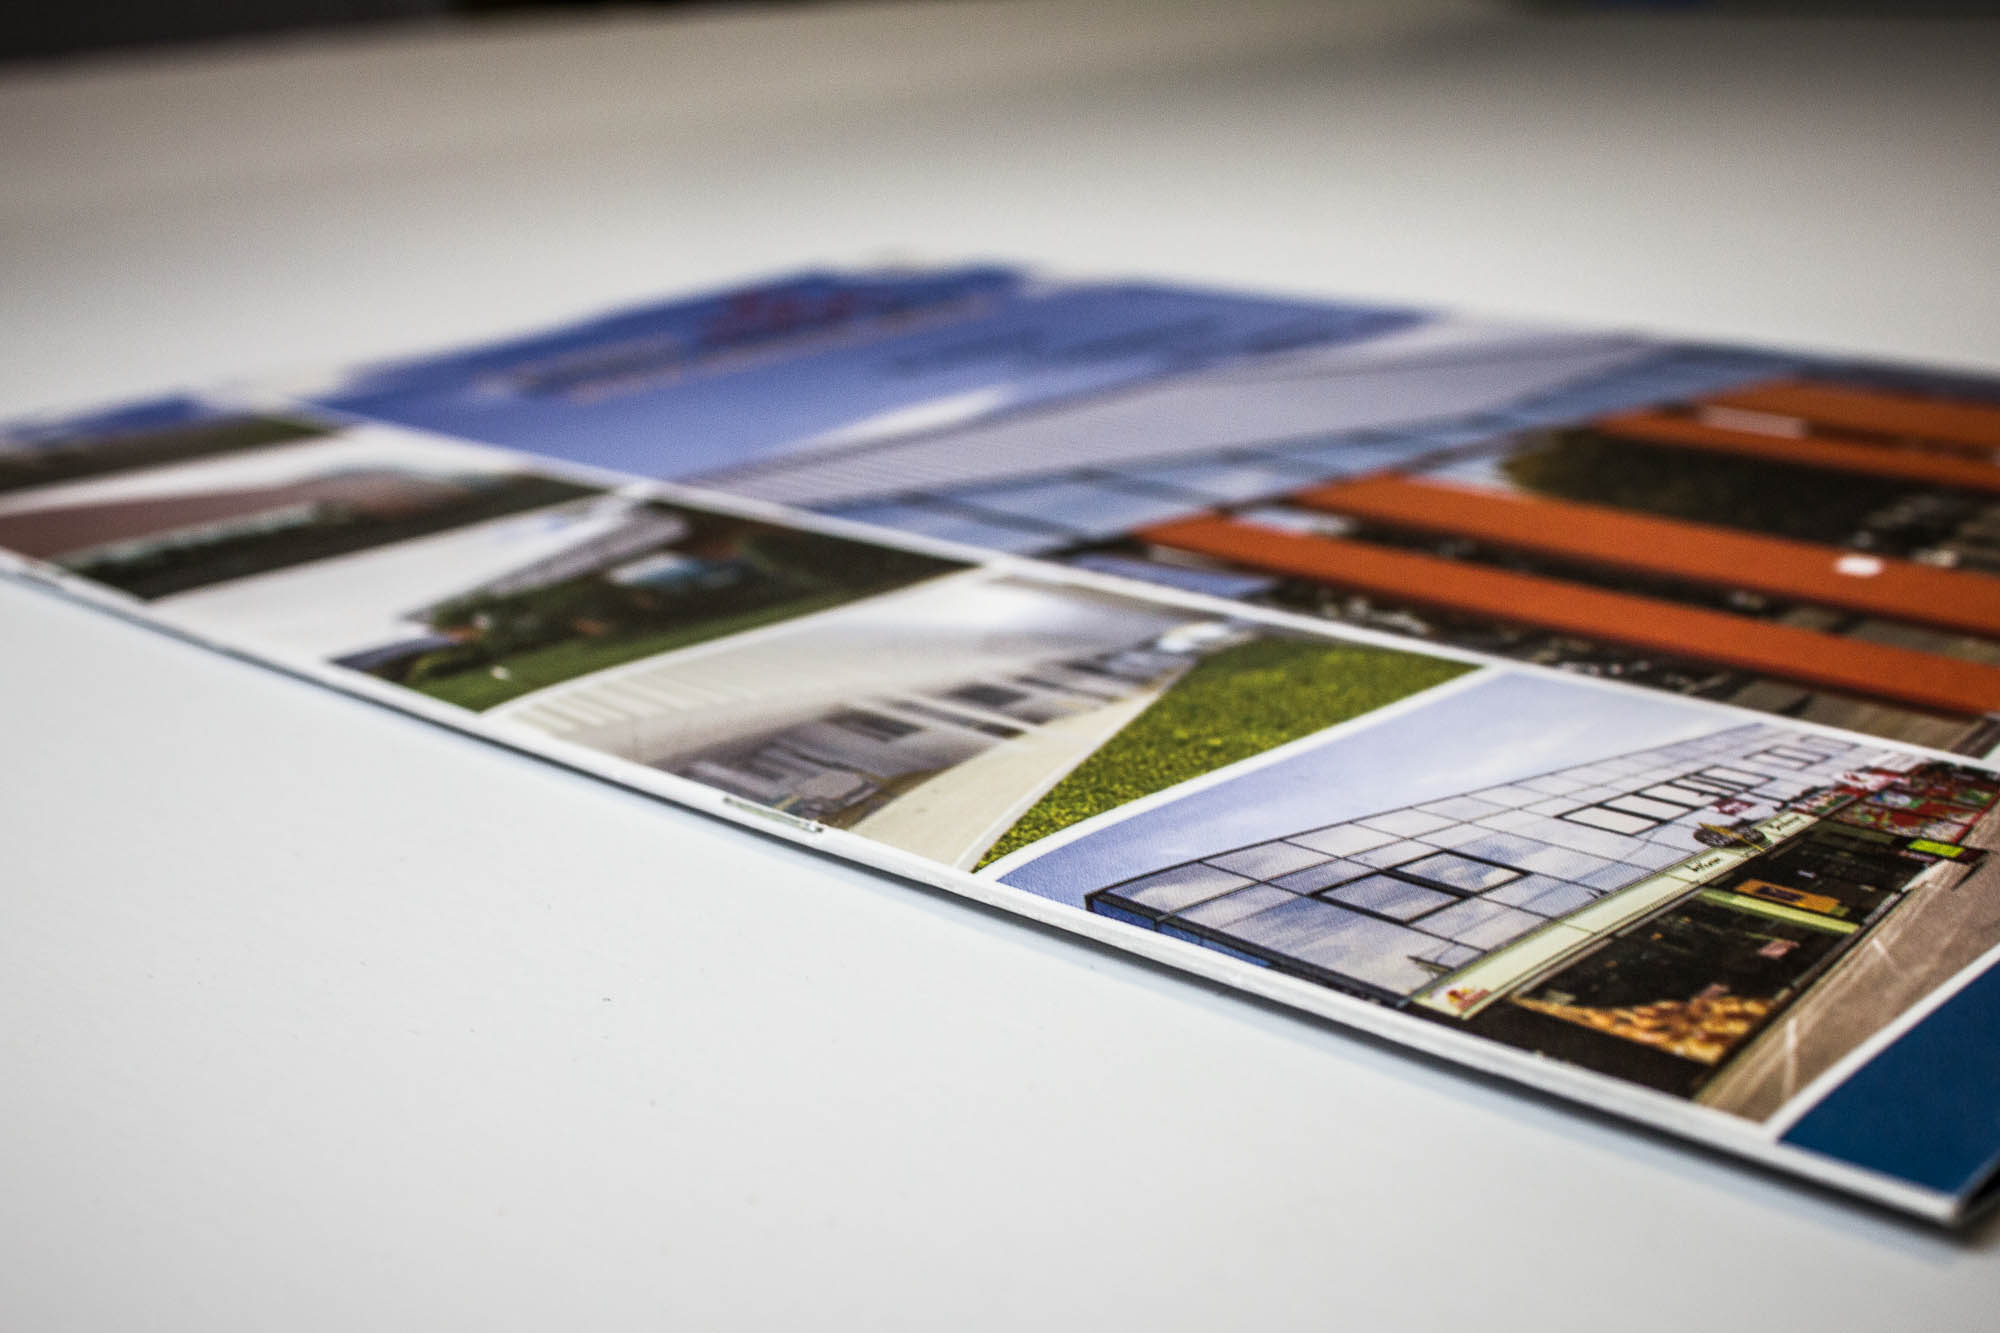 Façonnage - Brochures agrafées